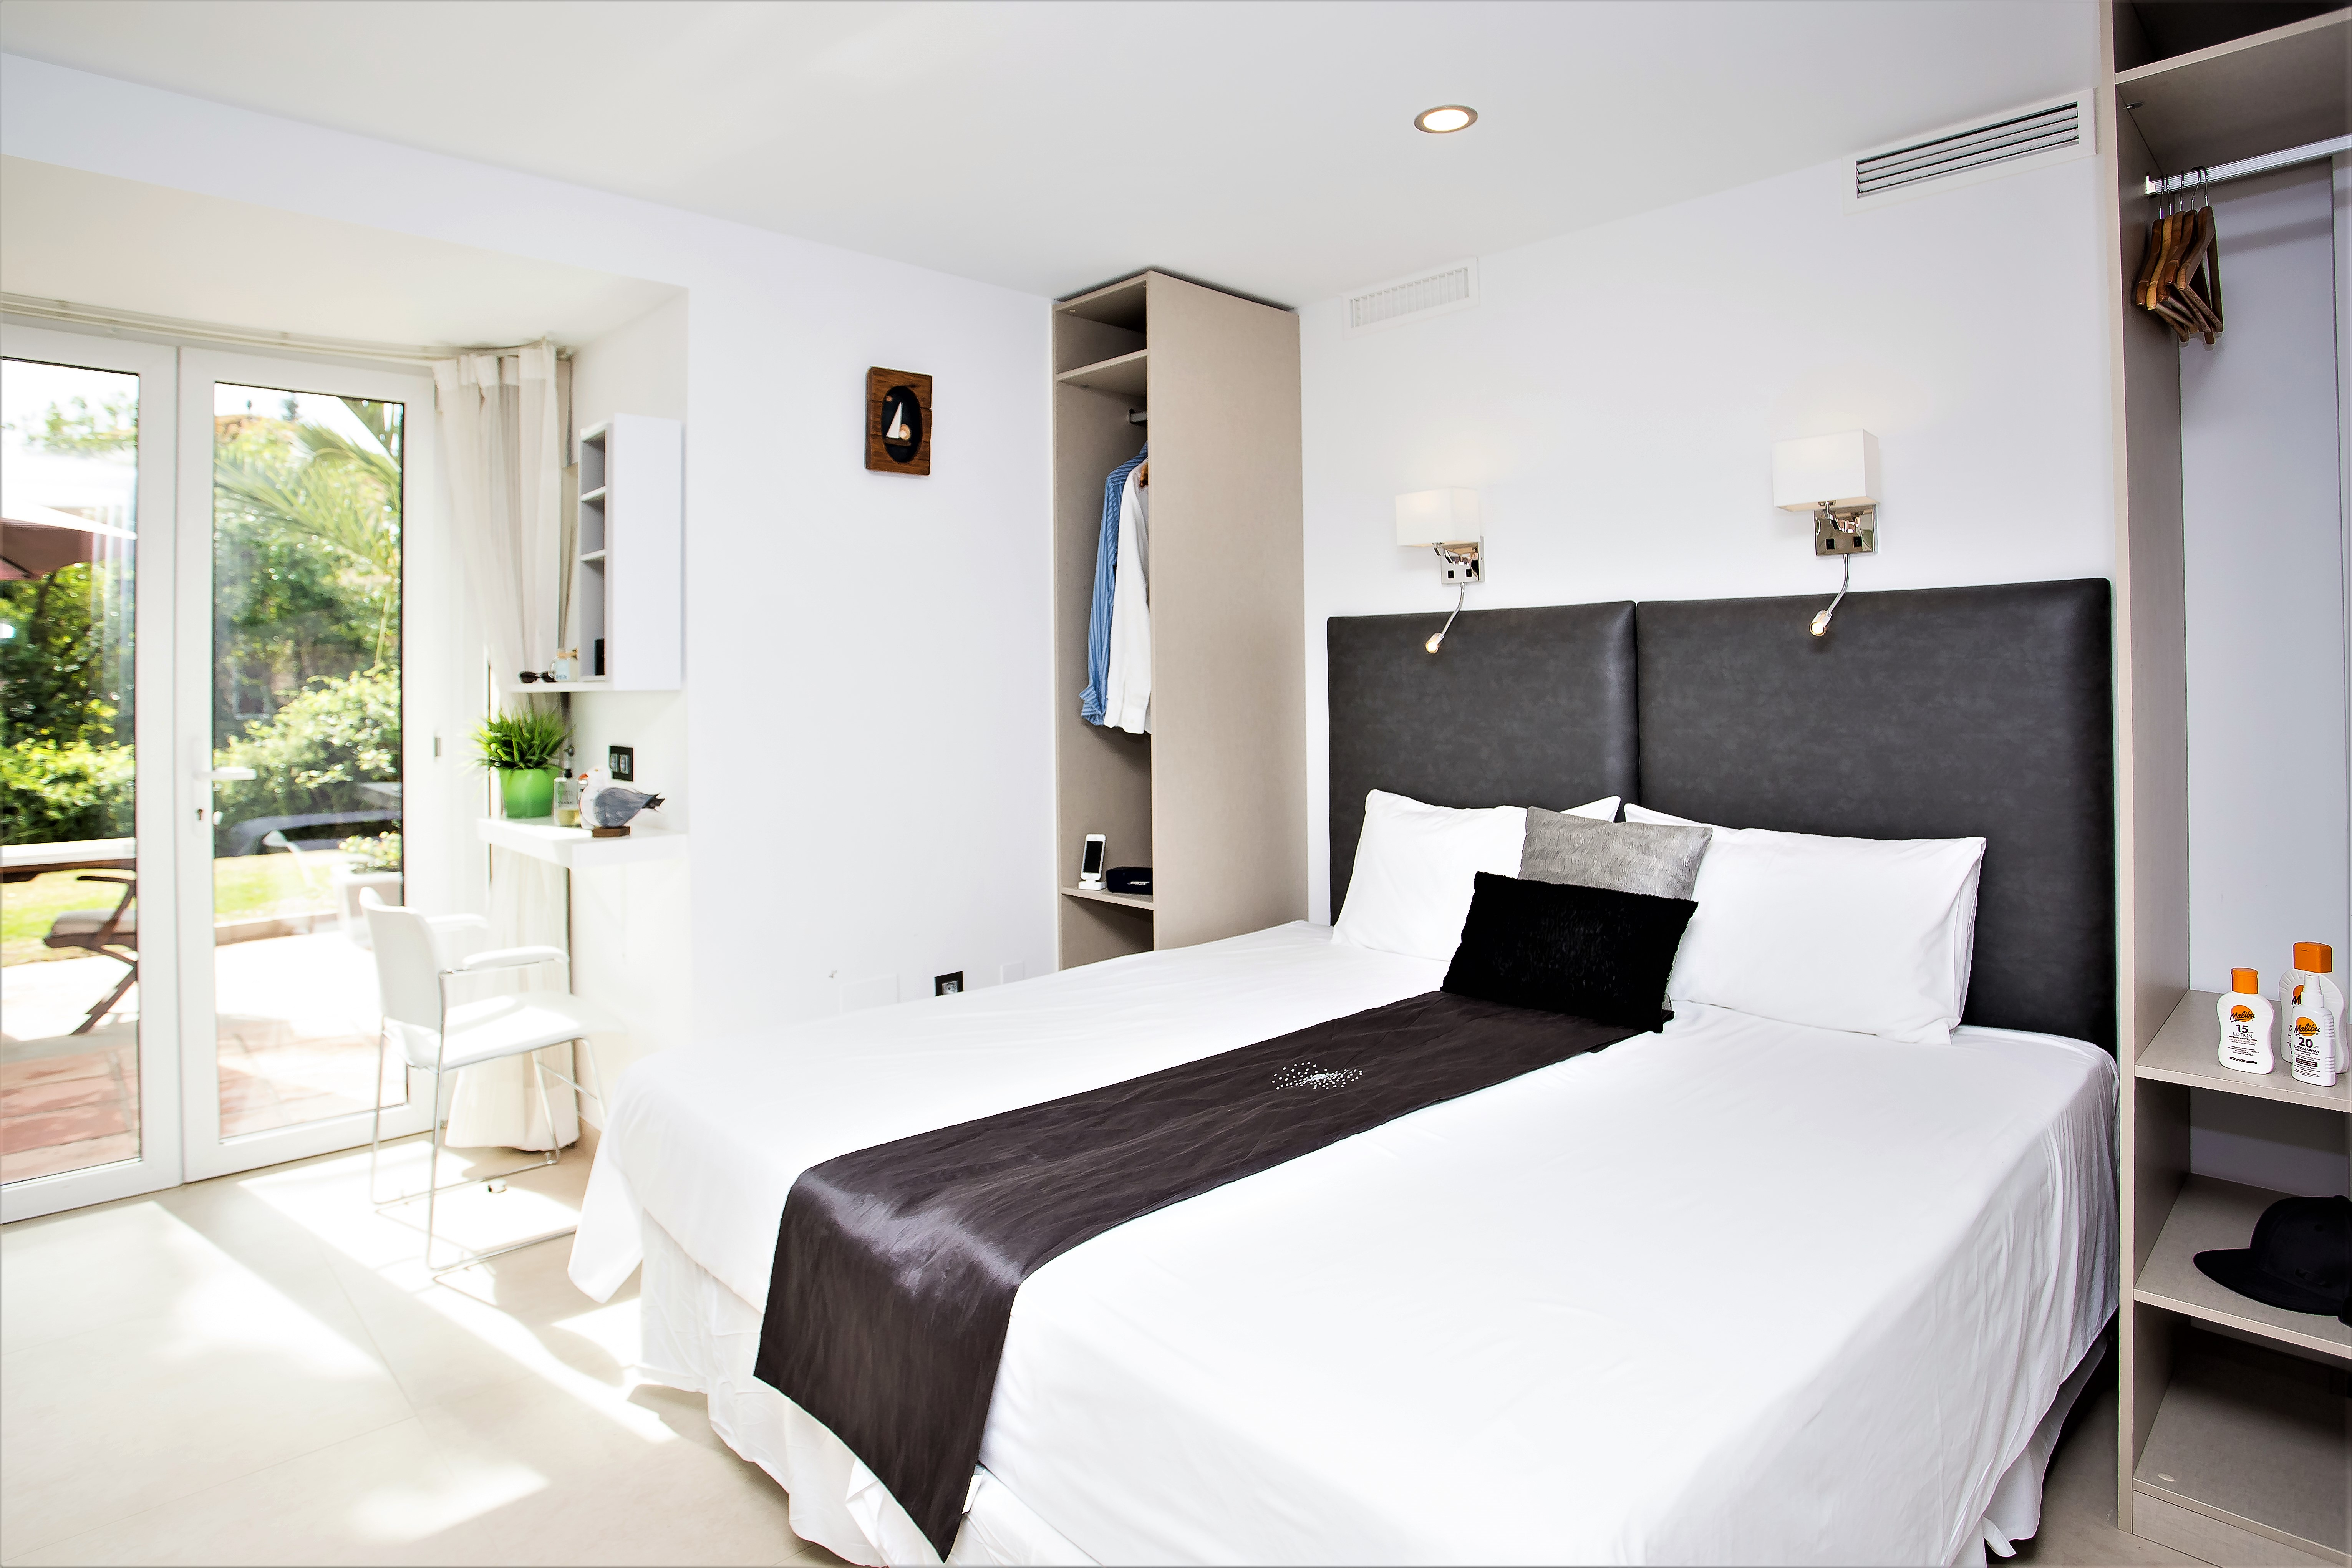 Apartment 8 Bedroom VILLA BY PUERTO BANUS   SEA 5 min                                photo 16956462